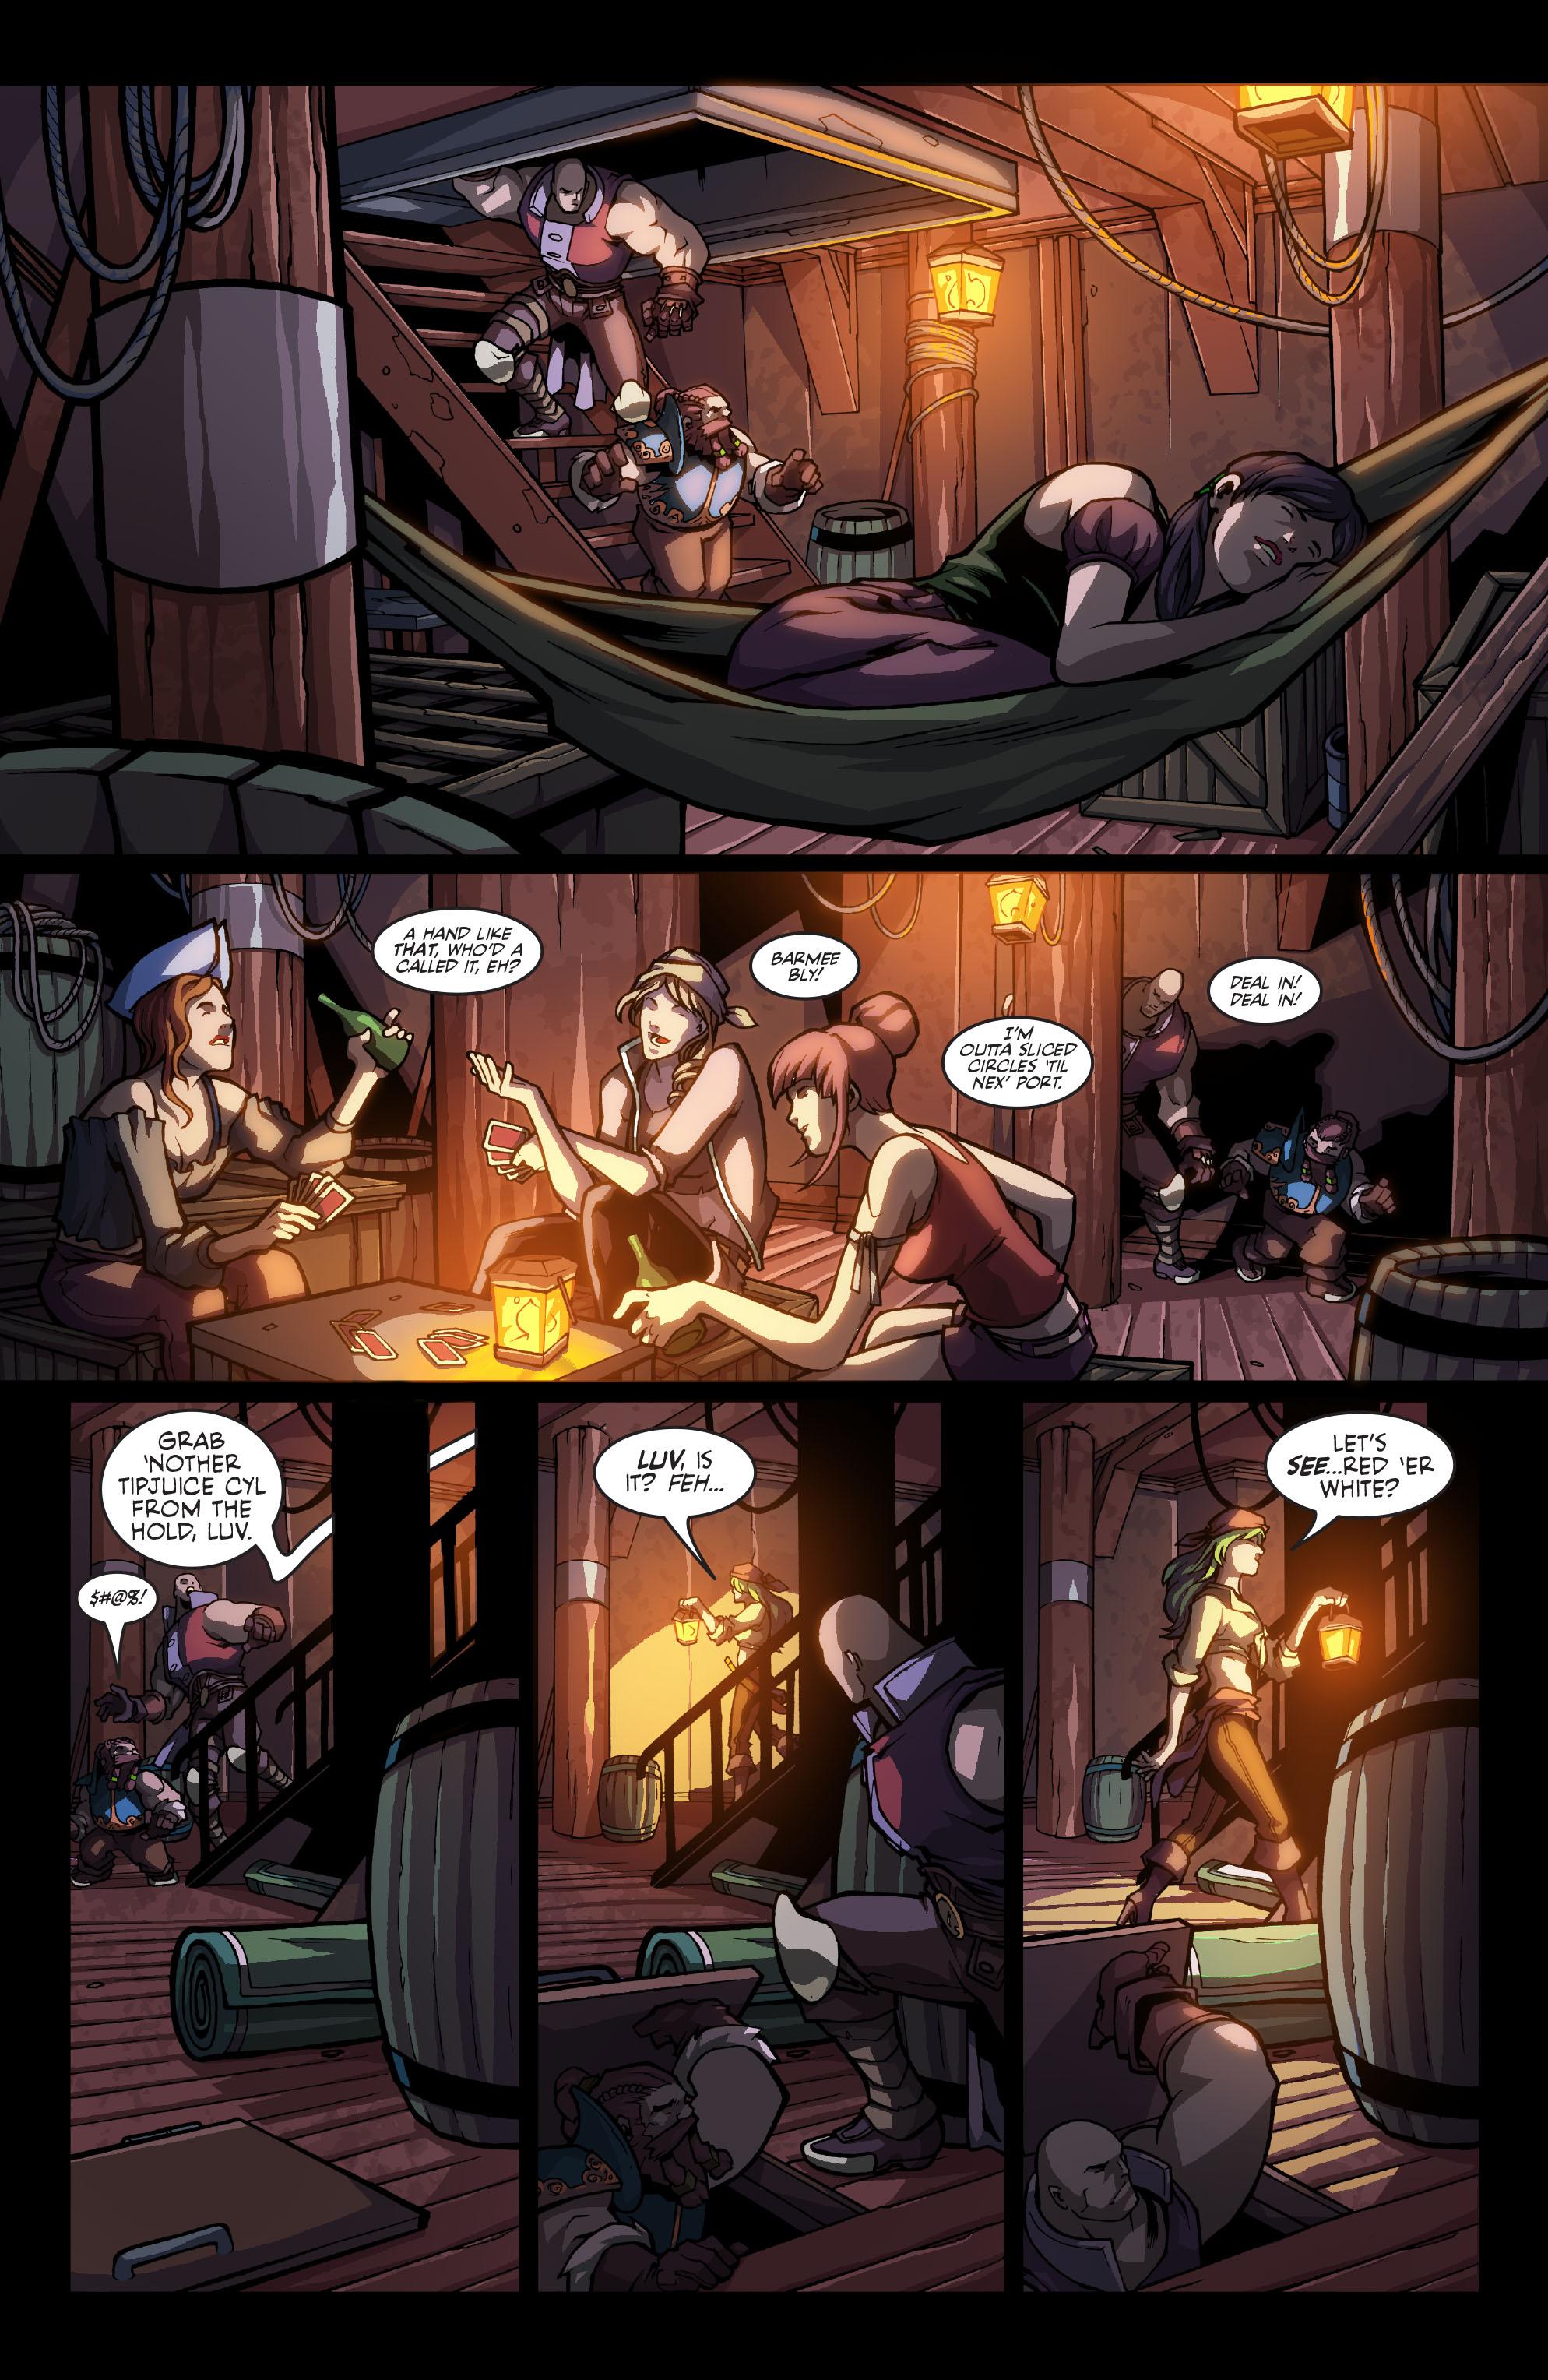 Read online Skullkickers comic -  Issue #13 - 7